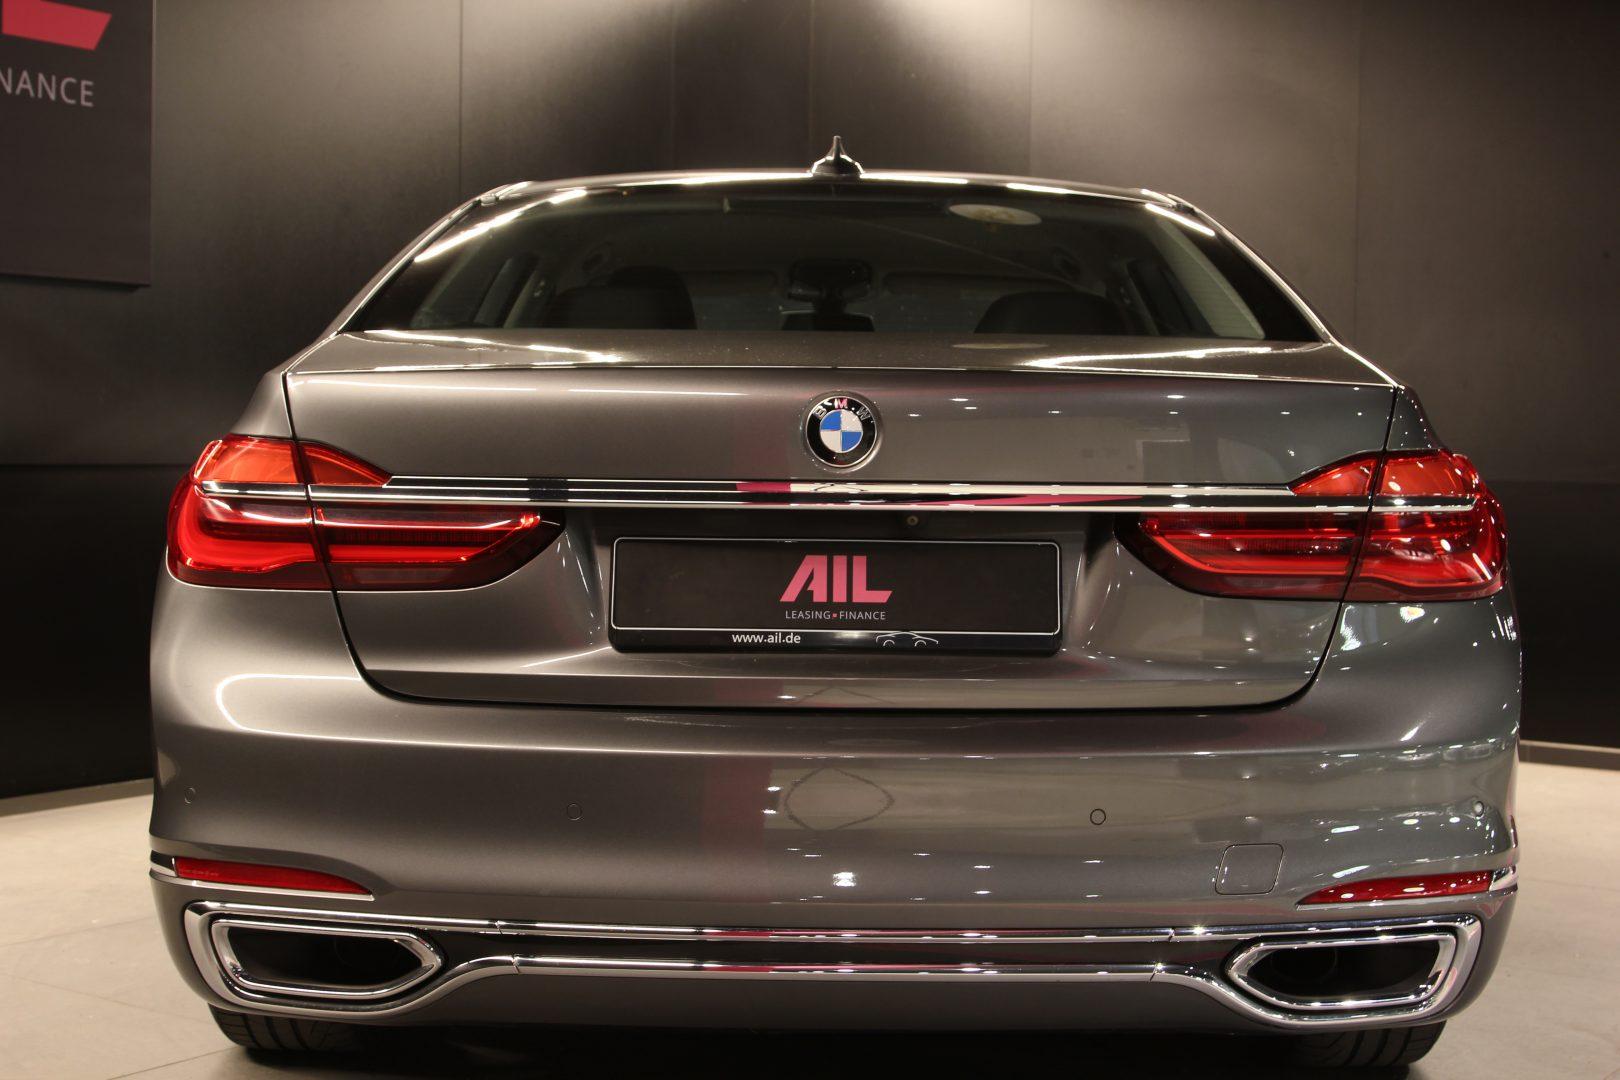 AIL BMW 730d Design Pure Excellence 2